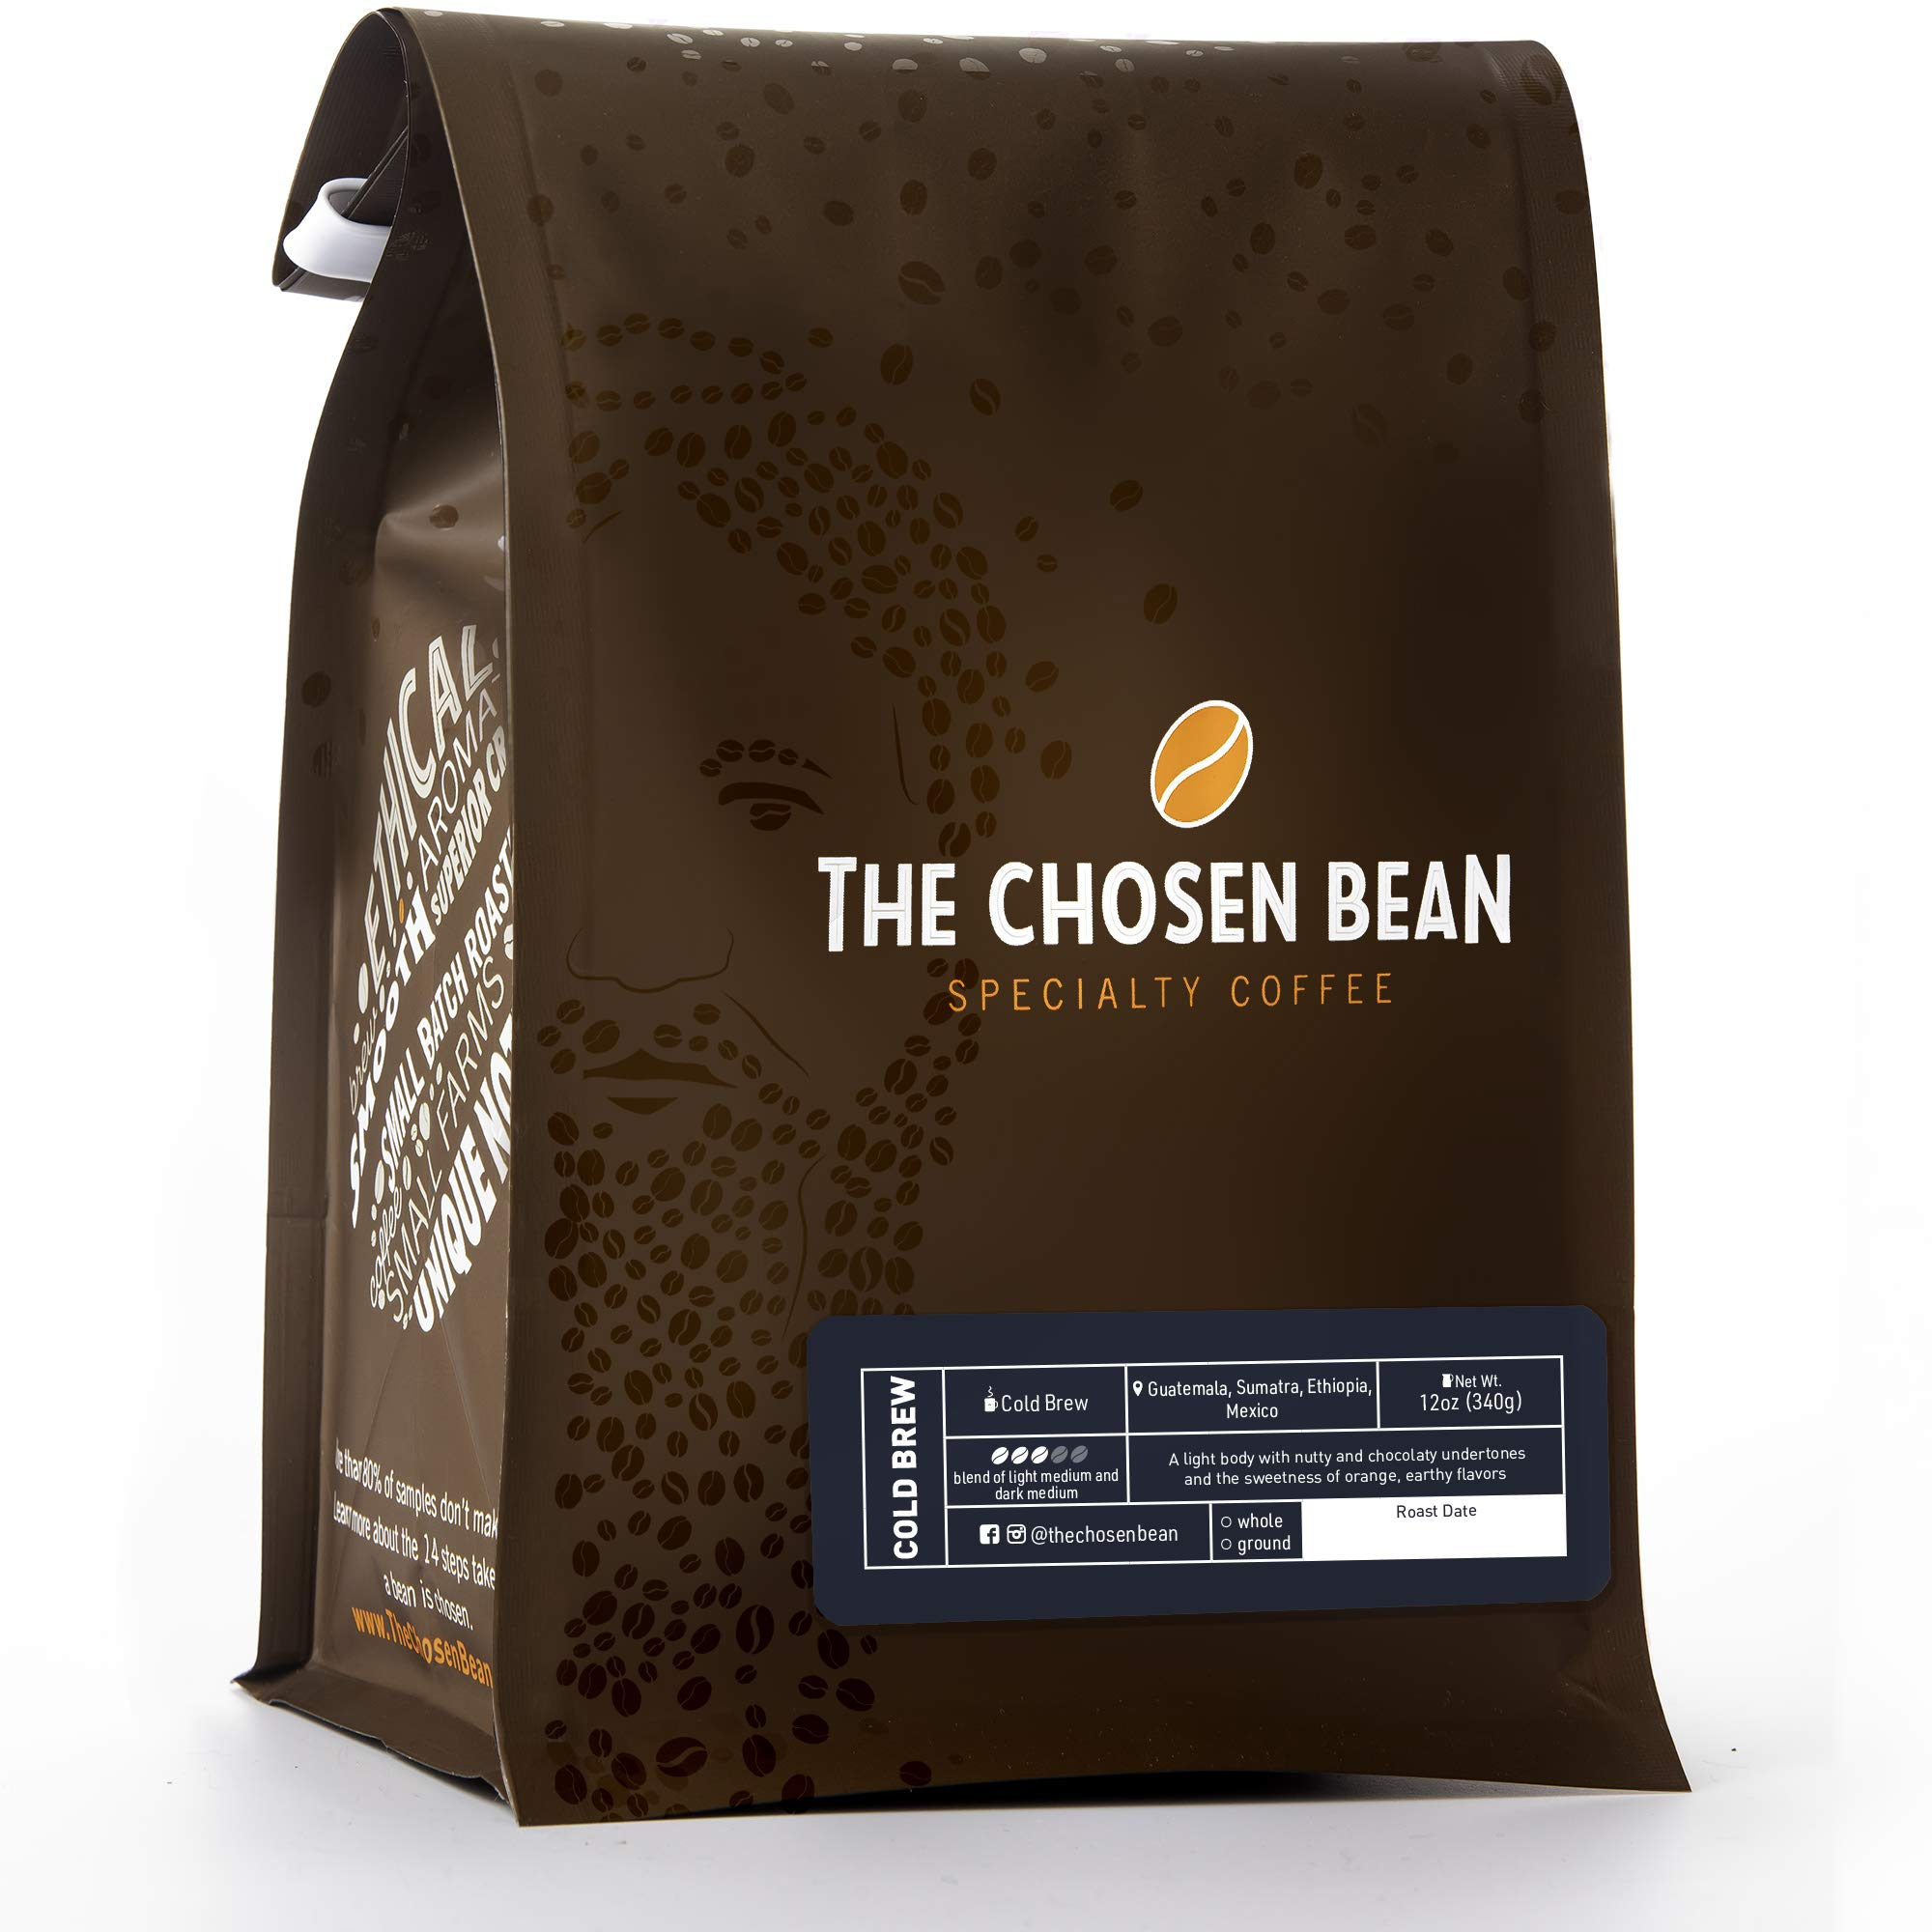 The Chosen Bean Premium Artisan Cold Brew Ground Coffee Beans, Small Batch Roasted, Organic and Fair Trade Roasters, 12 oz